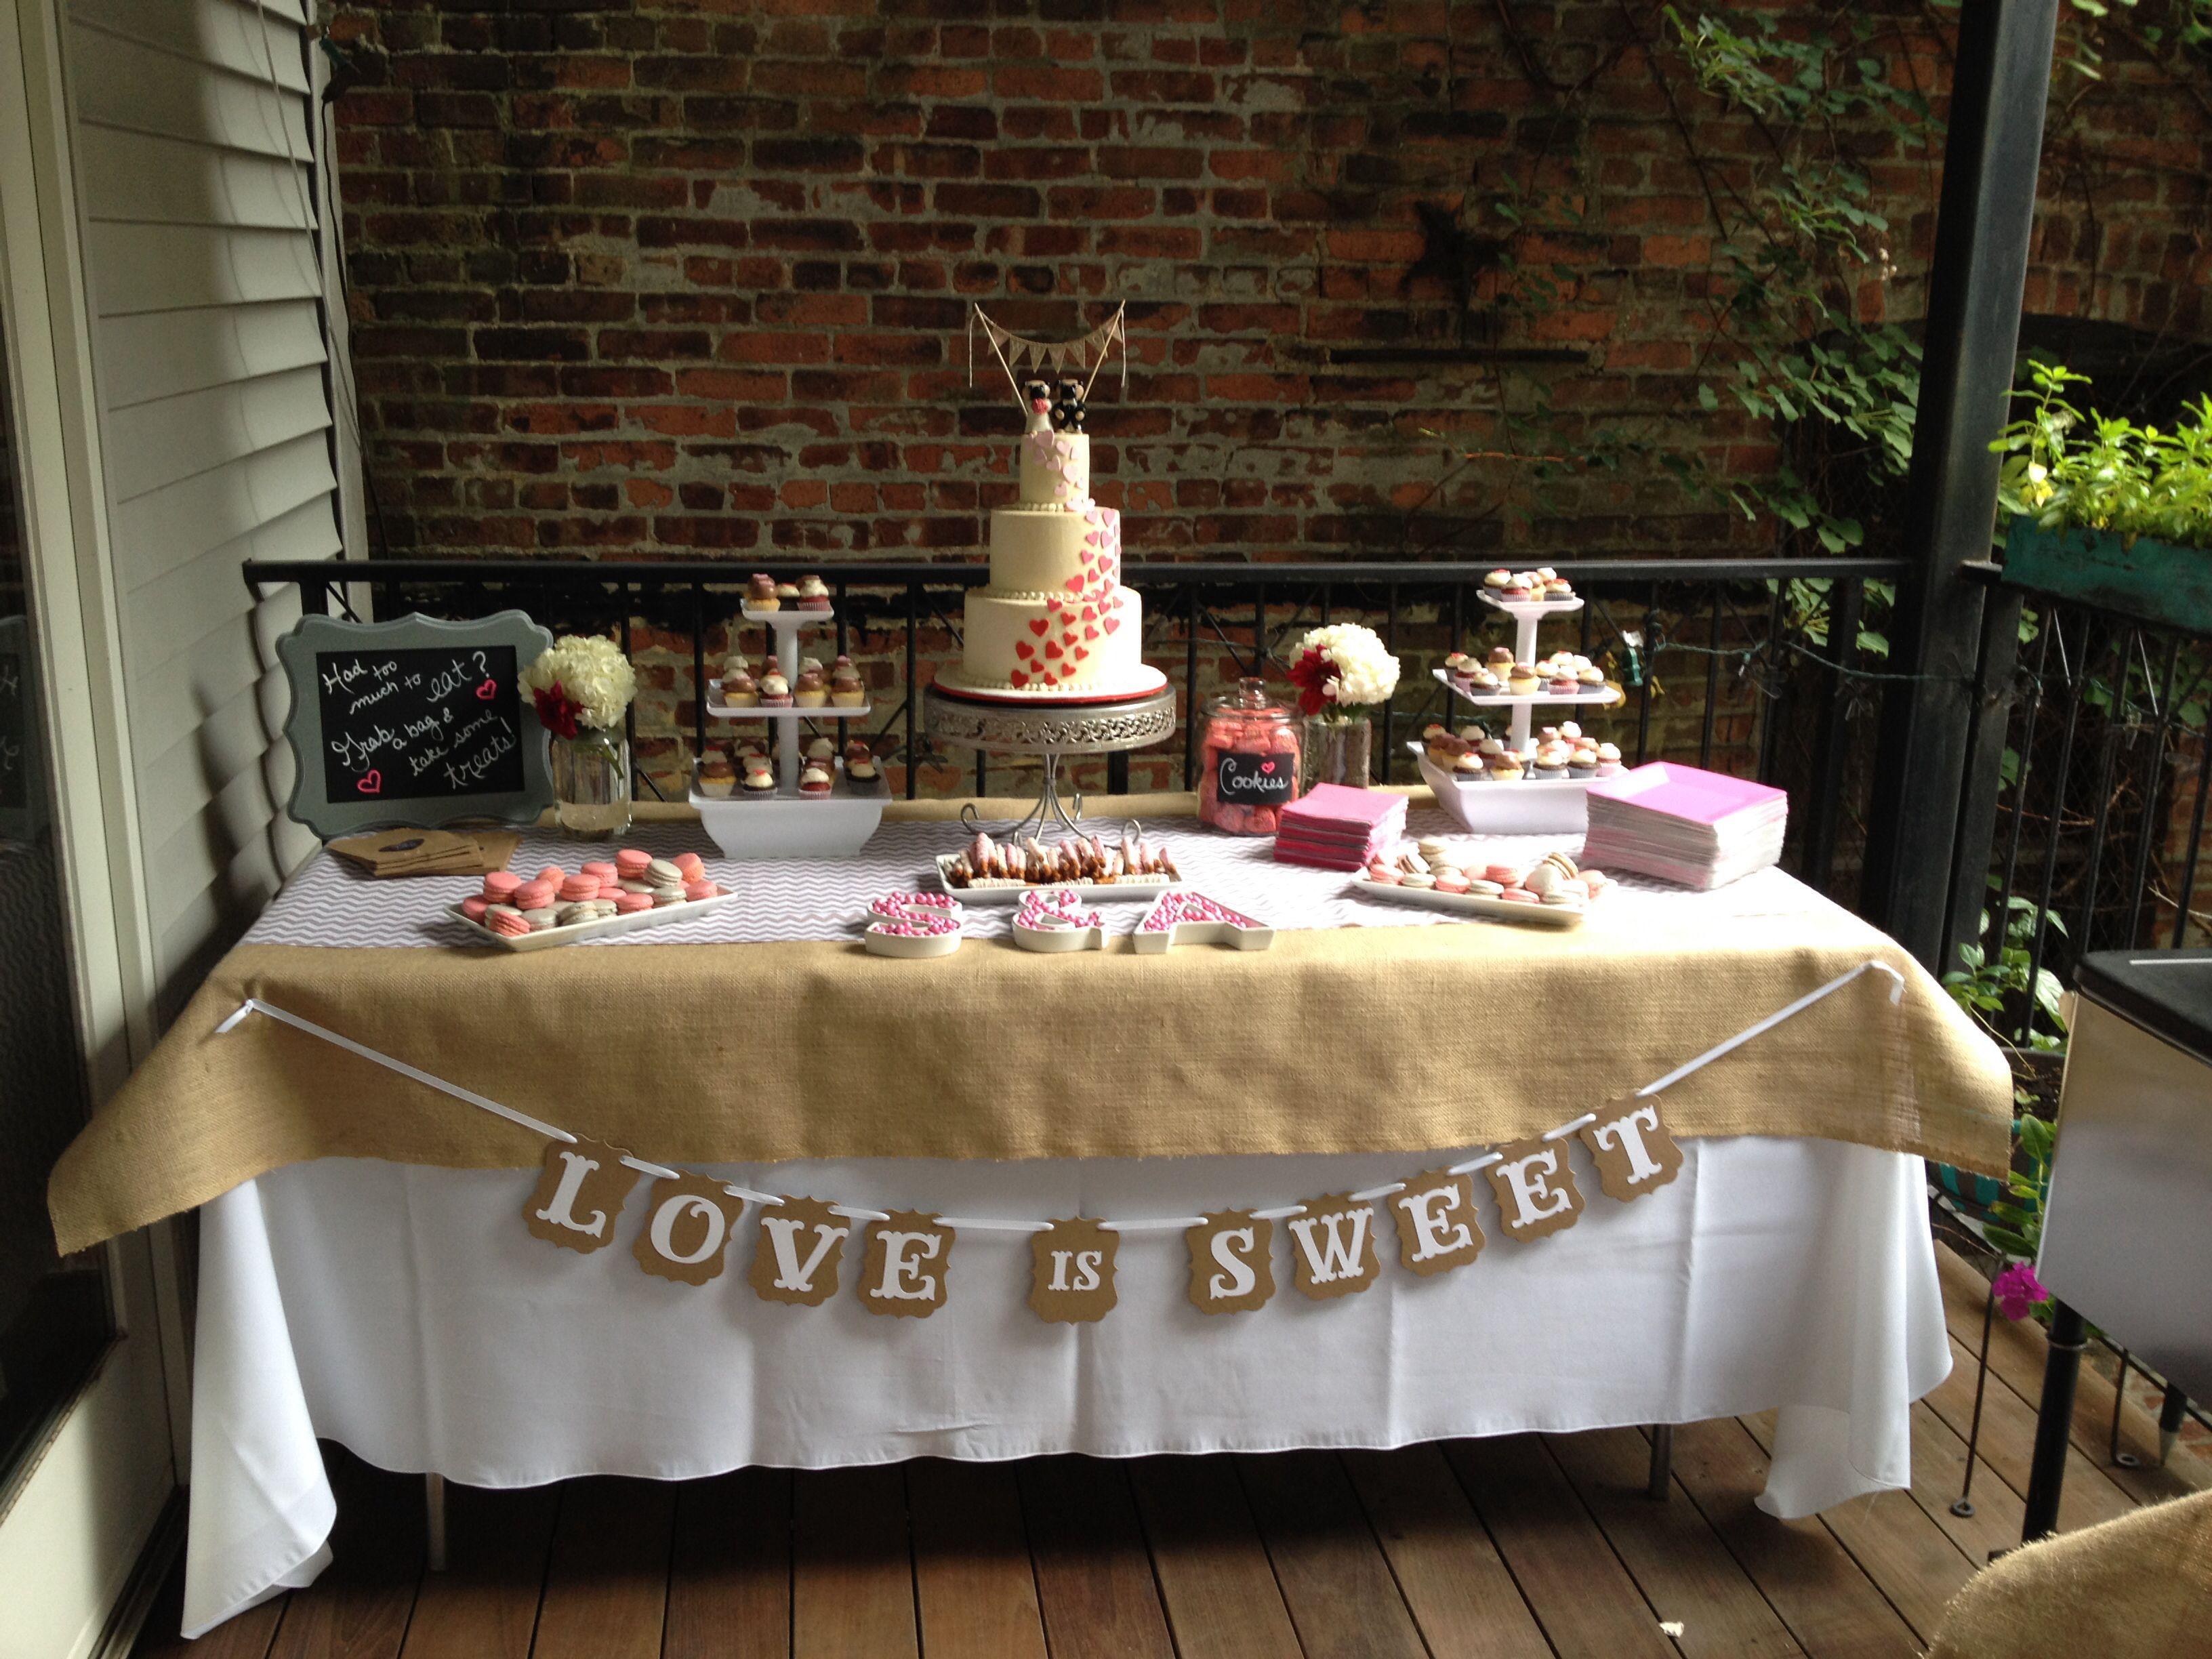 Kara's Party Ideas Boho Rustic Chic Engagement Party ... |Engagement Party Dessert Recipes